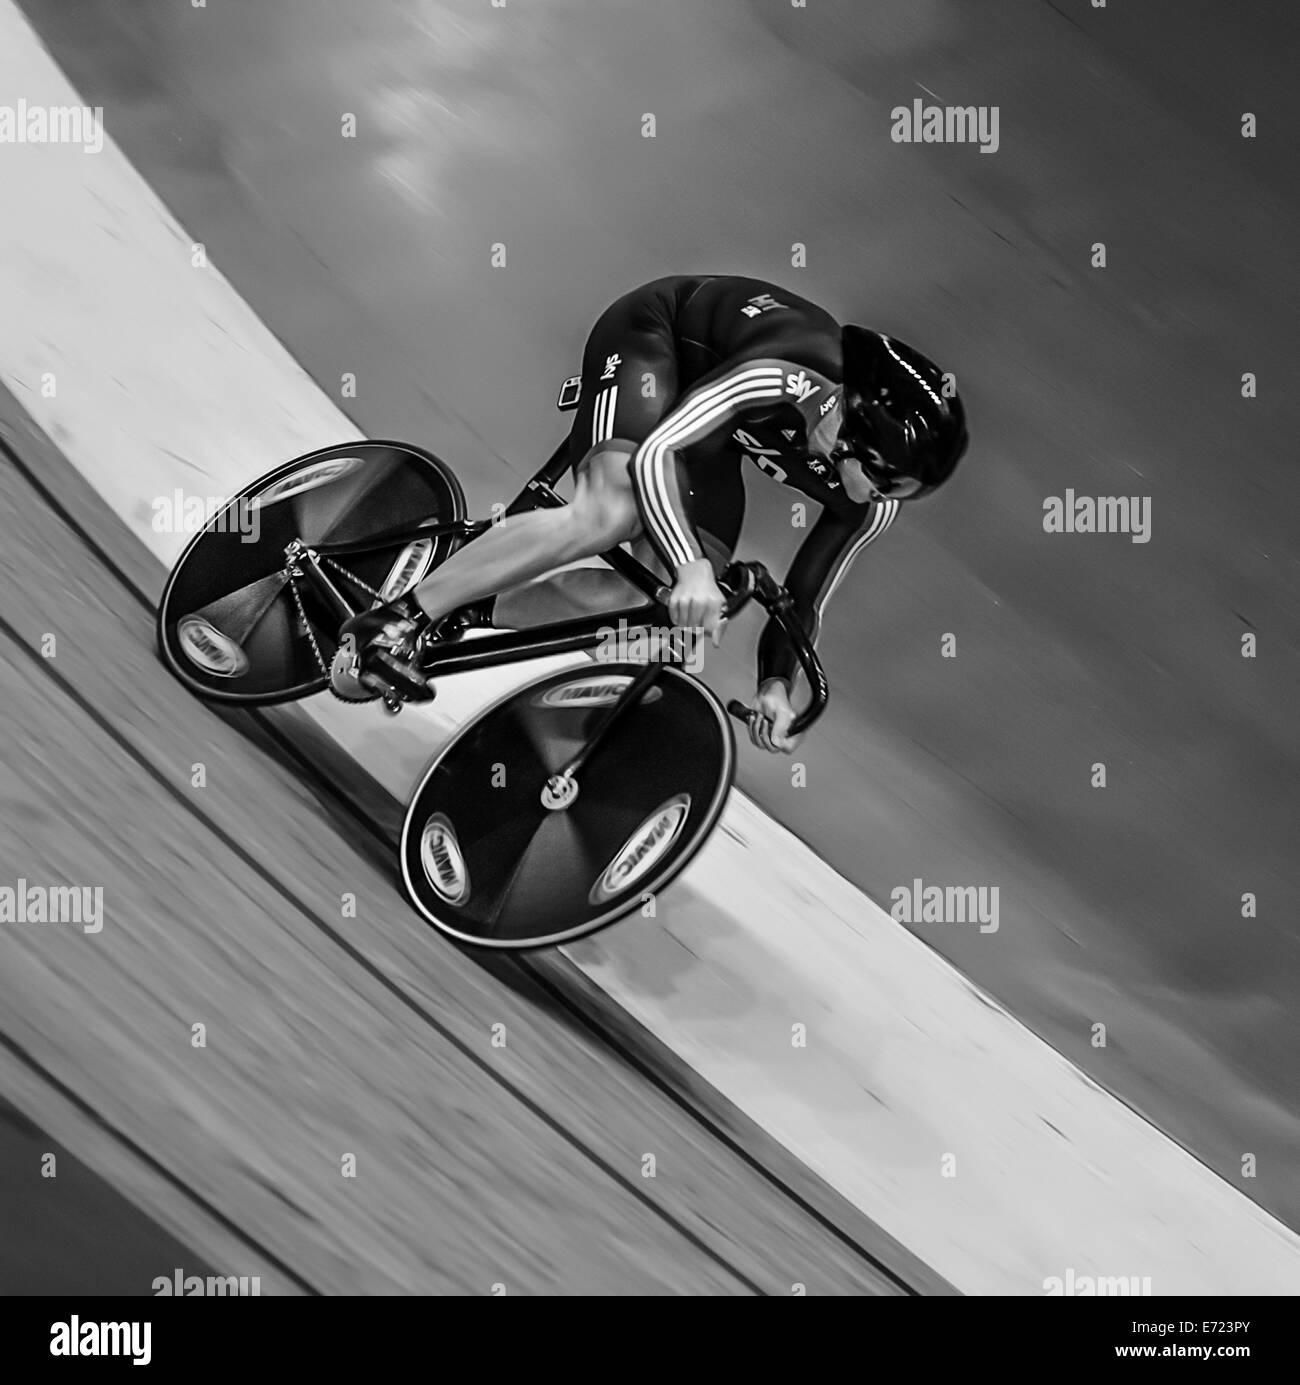 Sir Chris Hoy at speed. Stock Photo